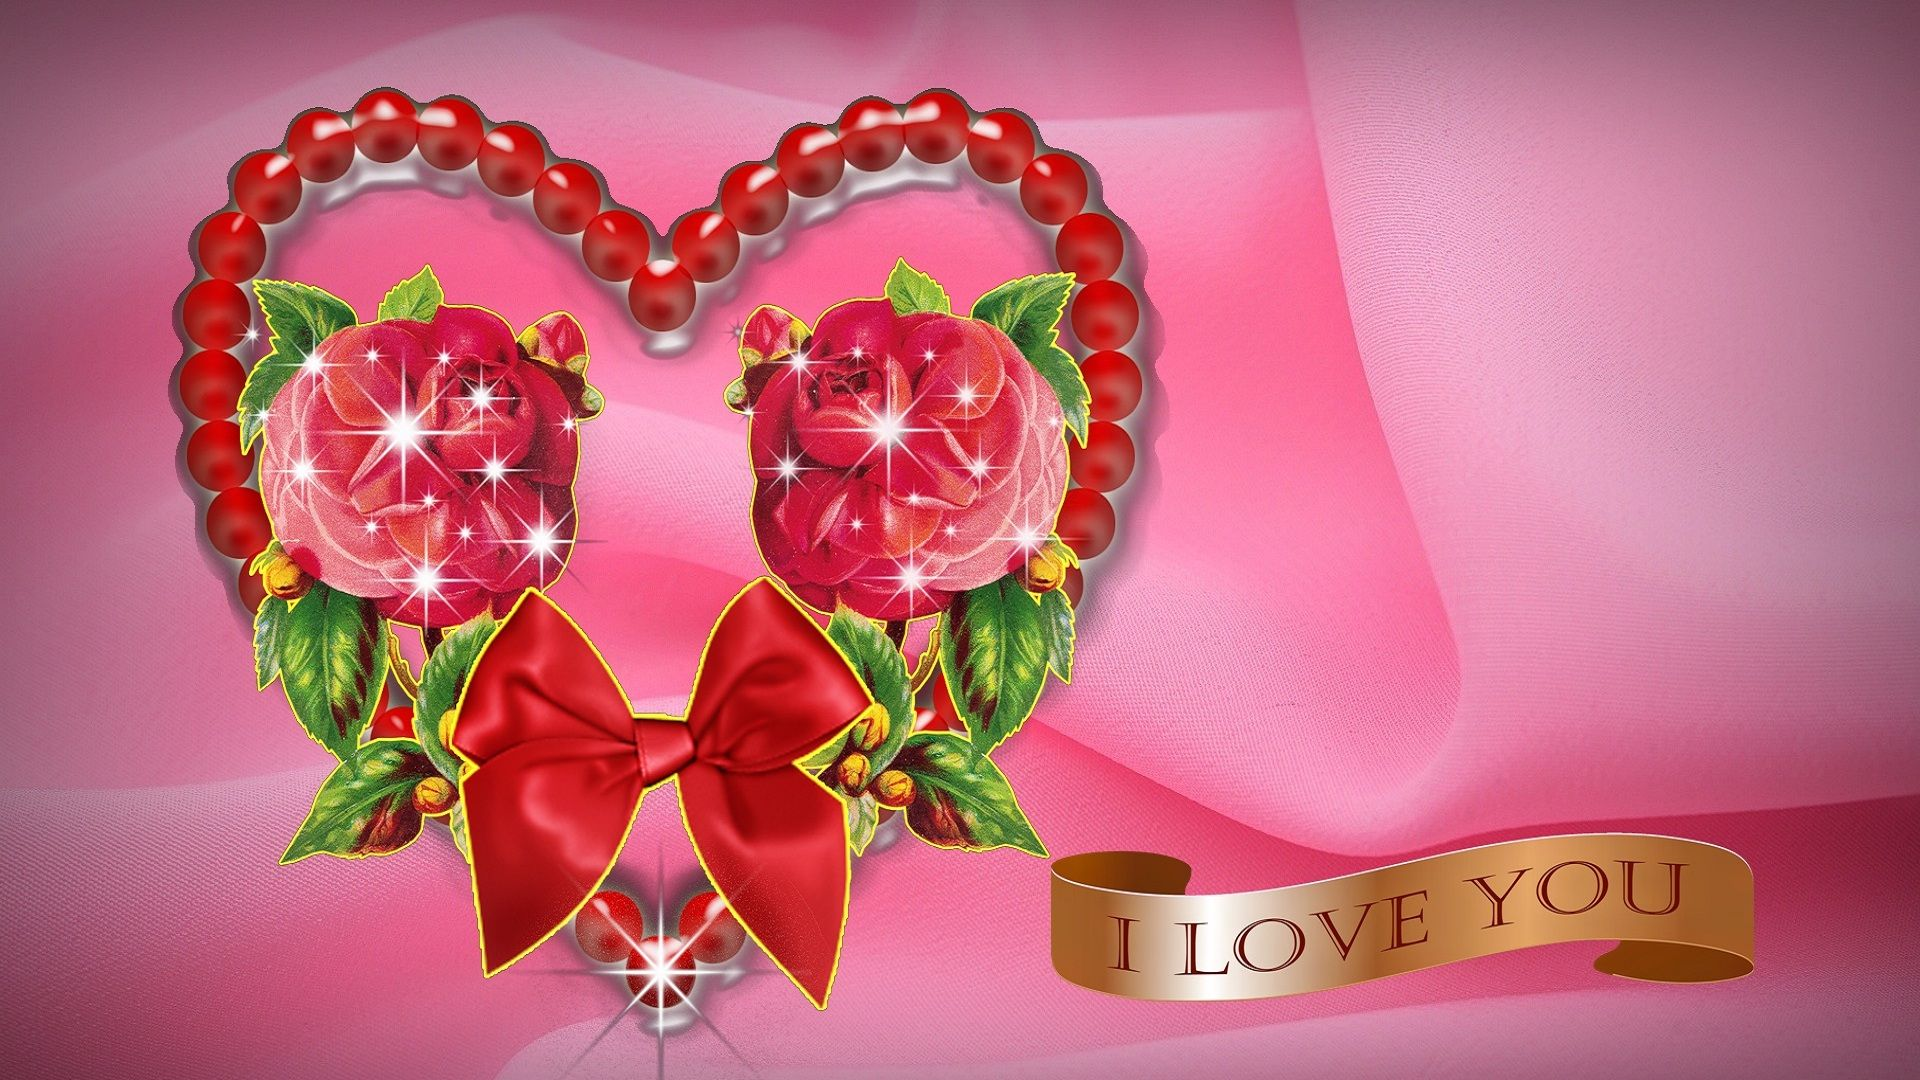 Beautiful flowers wallpaper free download archives free desktop - Pink Rose Flowers Love Wallpaper For Desktop Hd Love Wallpapers Love Flower Images Wallpapers Wallpapers